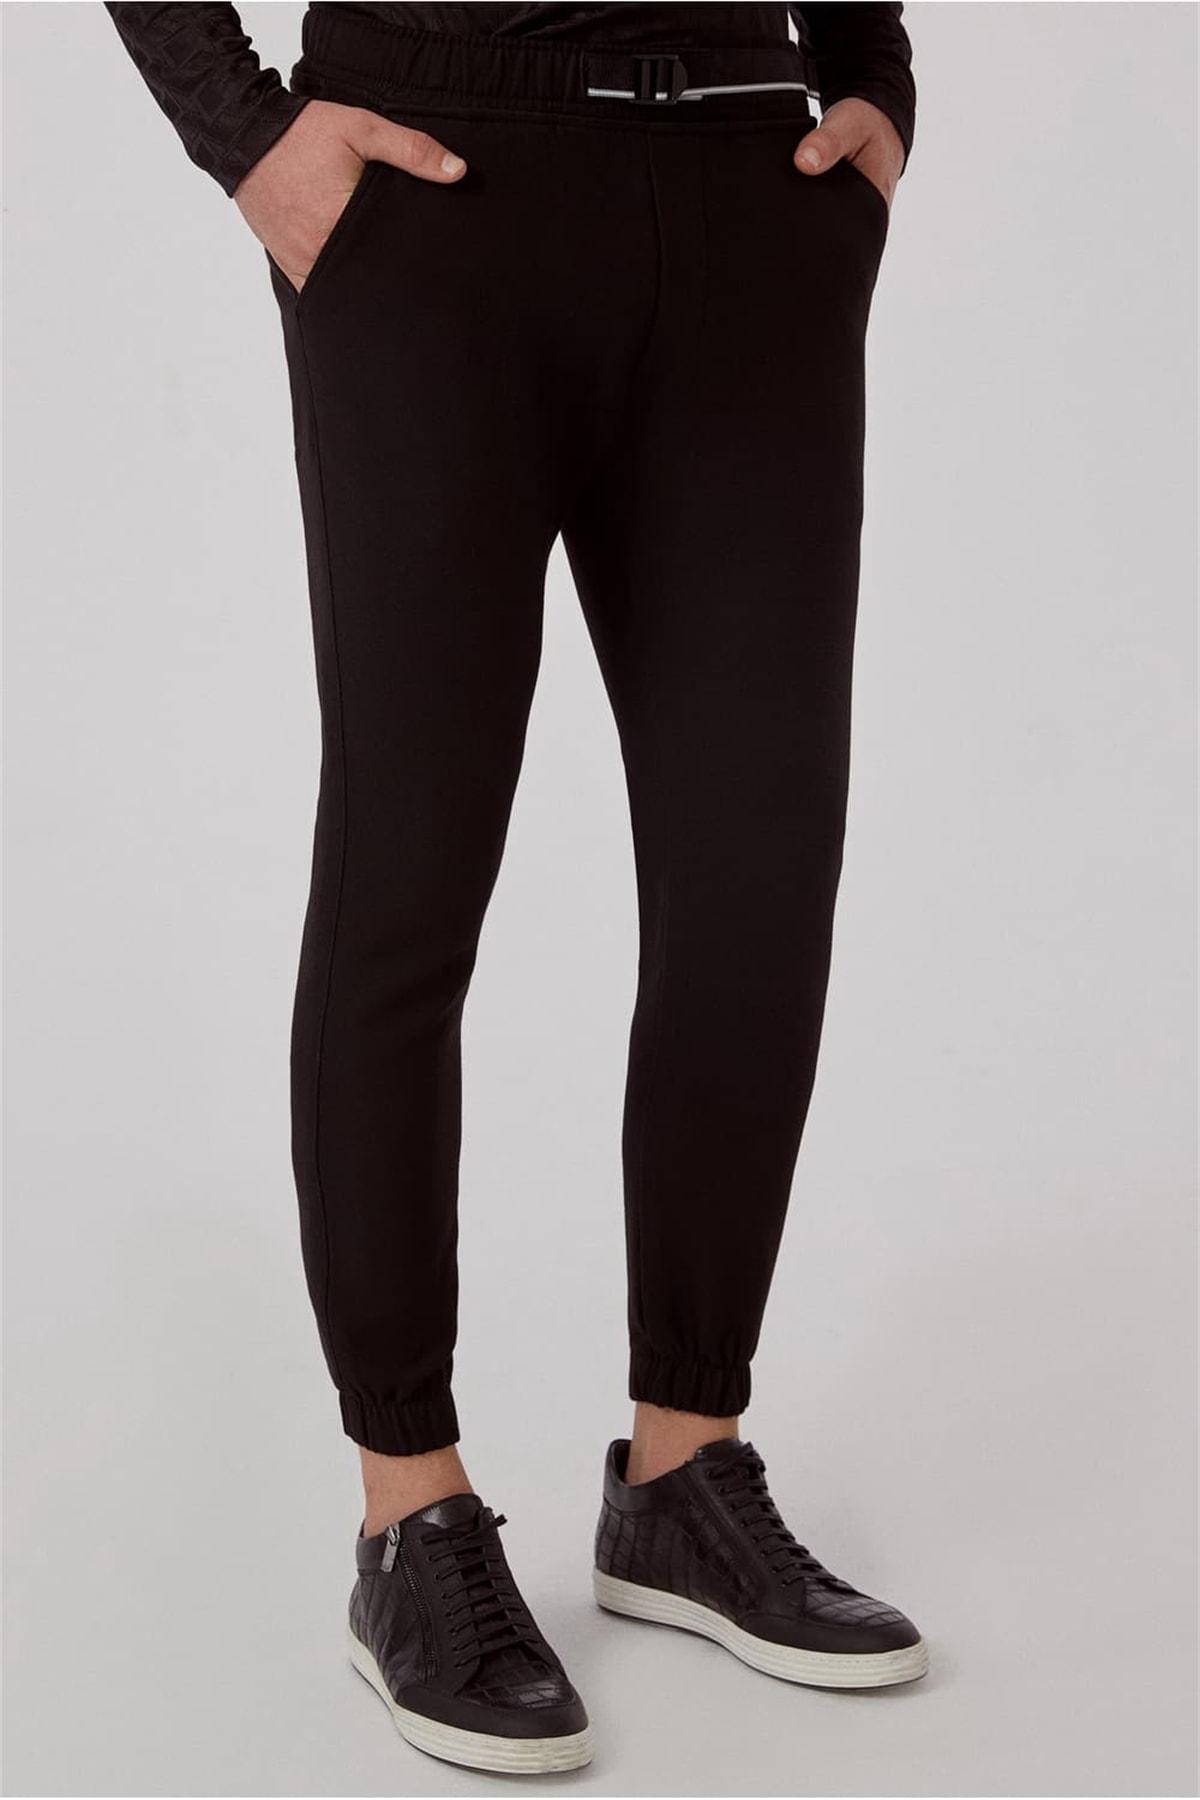 Efor ATP 017 Slim Fit Siyah Spor Pantolon 2